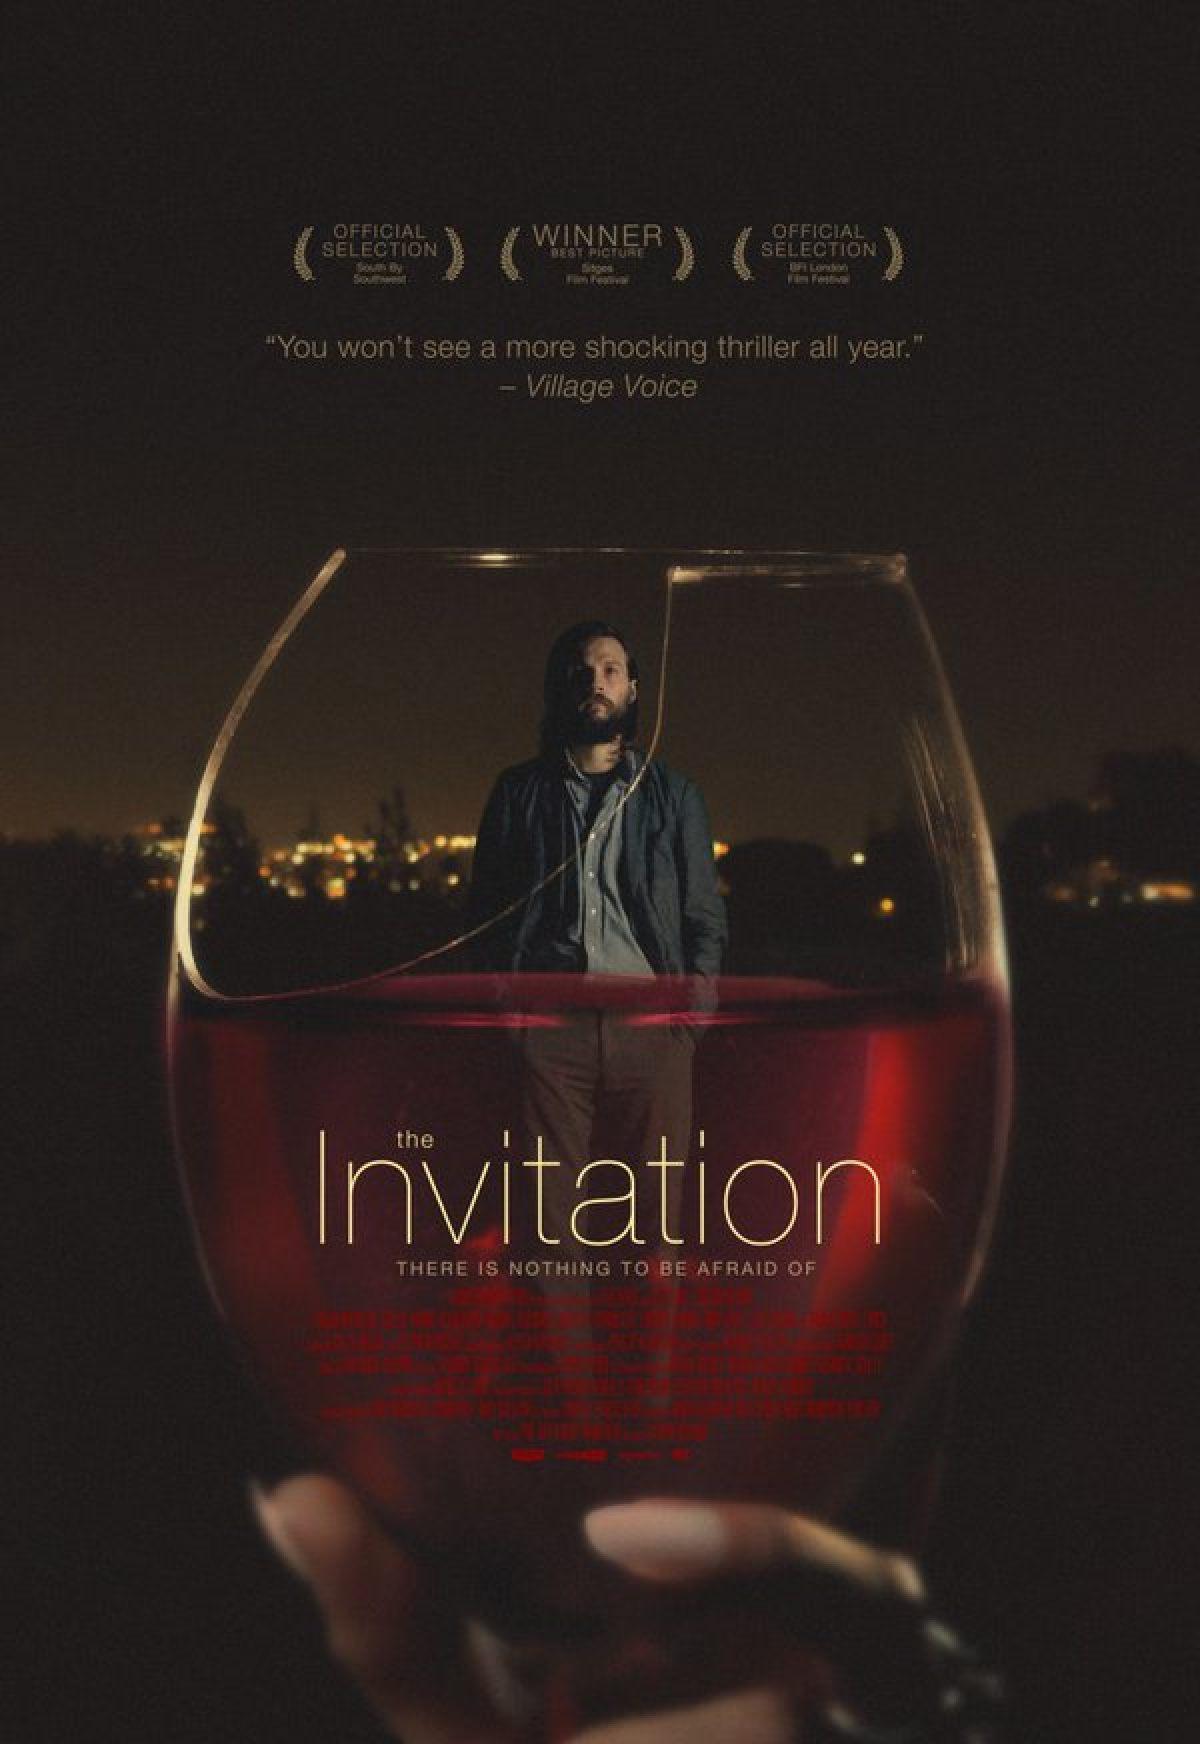 melhores-filmes-de-terror-de-2016-the-invitation